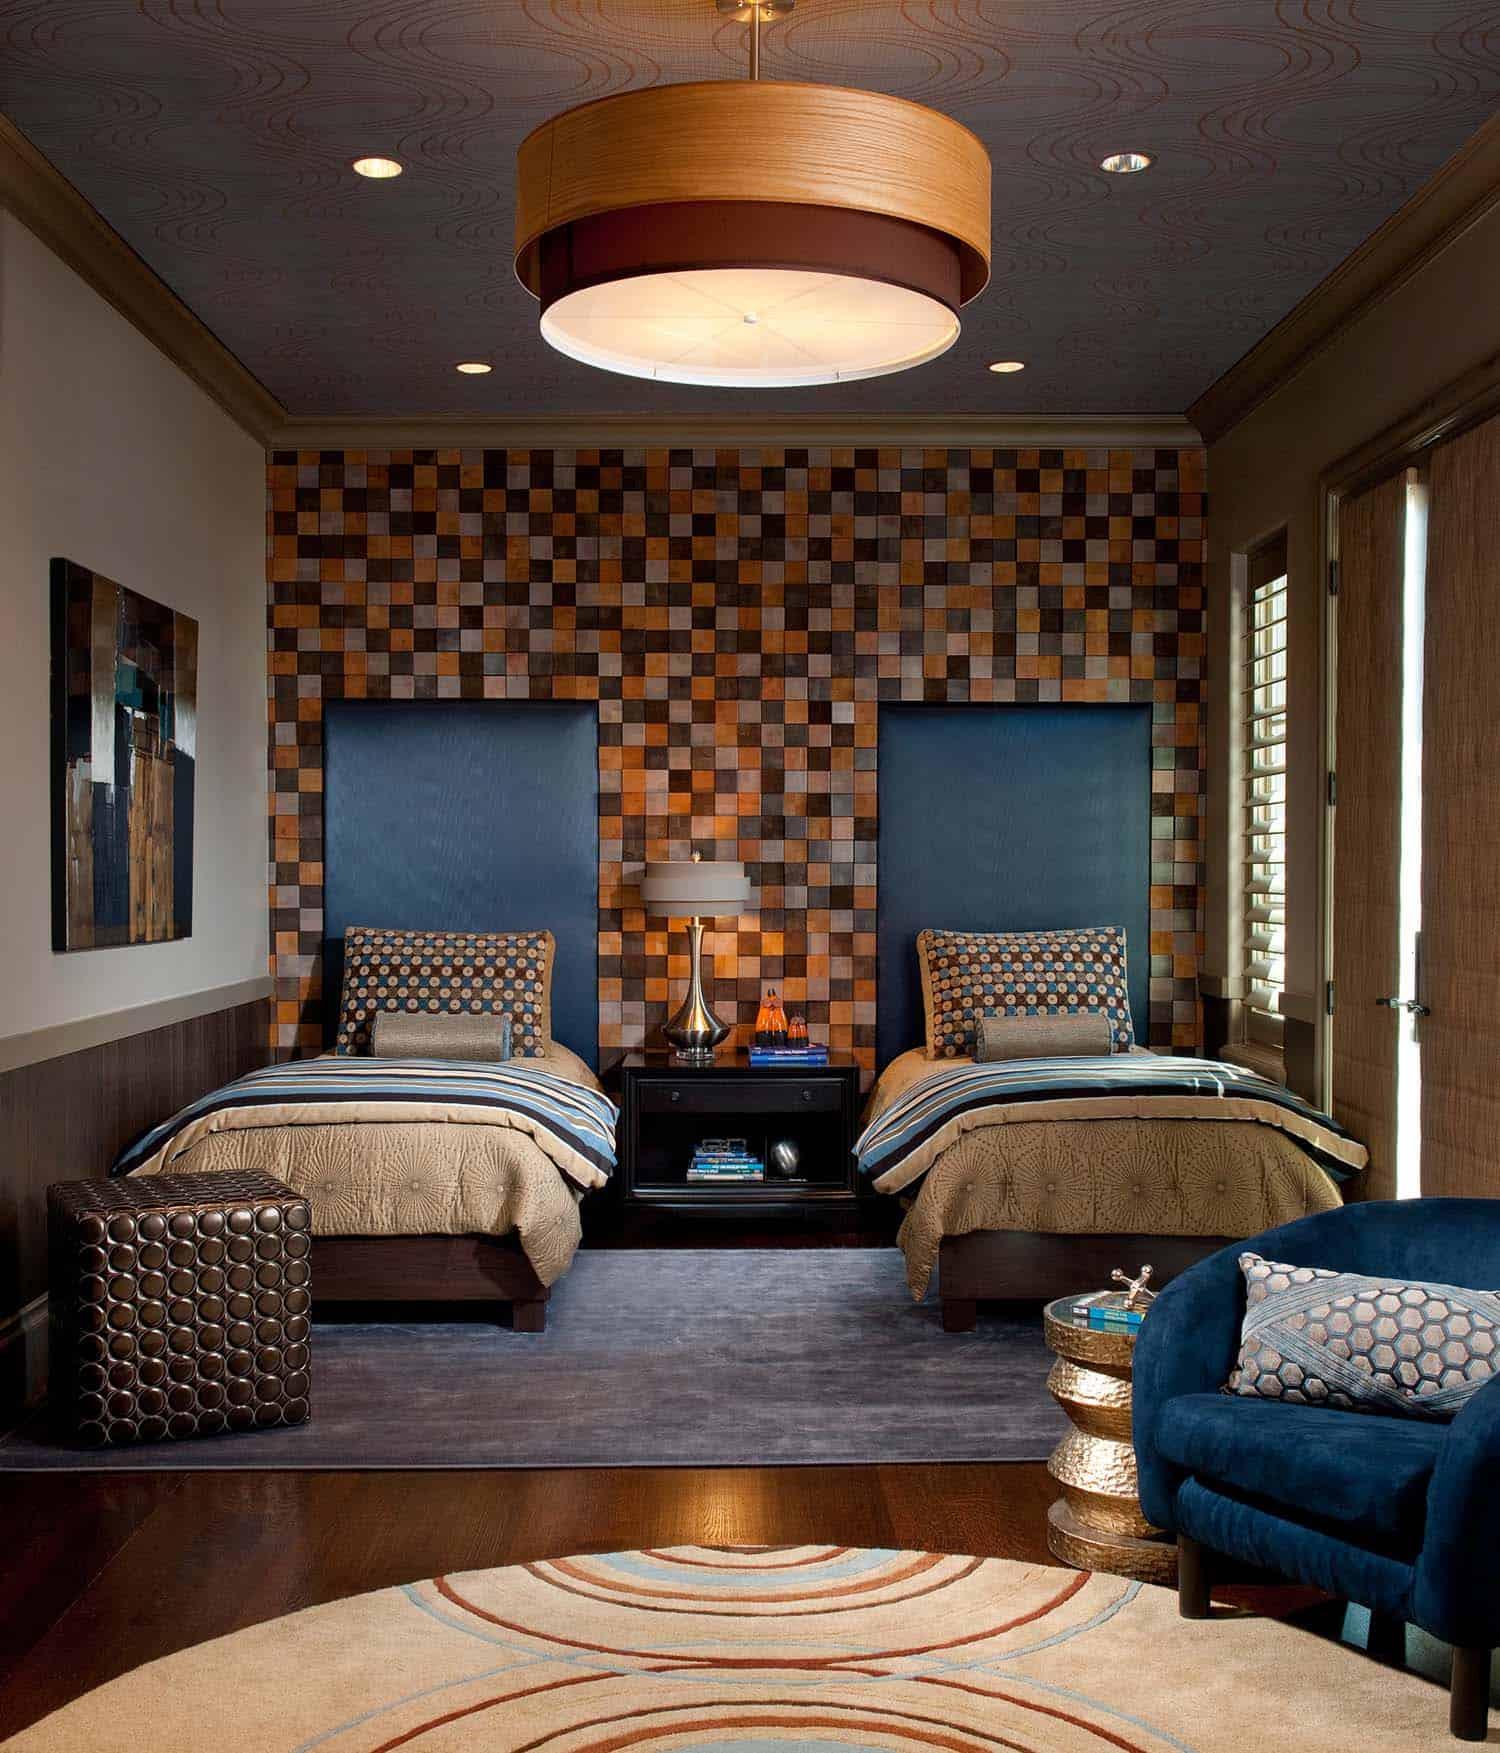 Contemporary Style Home-Dallas Design Group-21-1 Kindesign